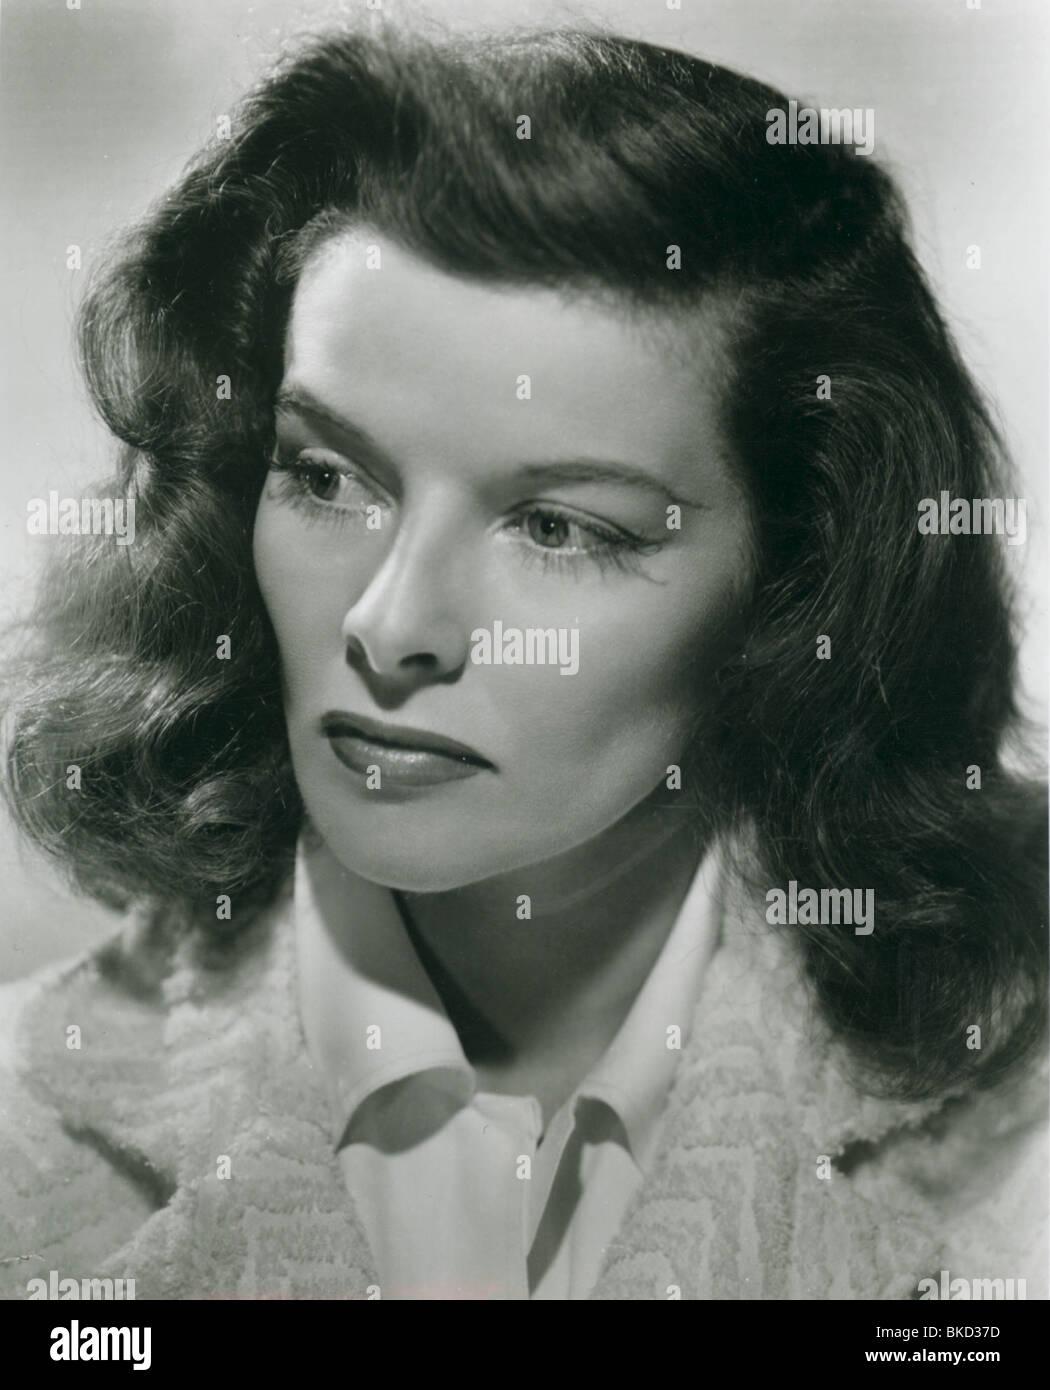 KATHARINE HEPBURN PORTRAIT - Stock Image